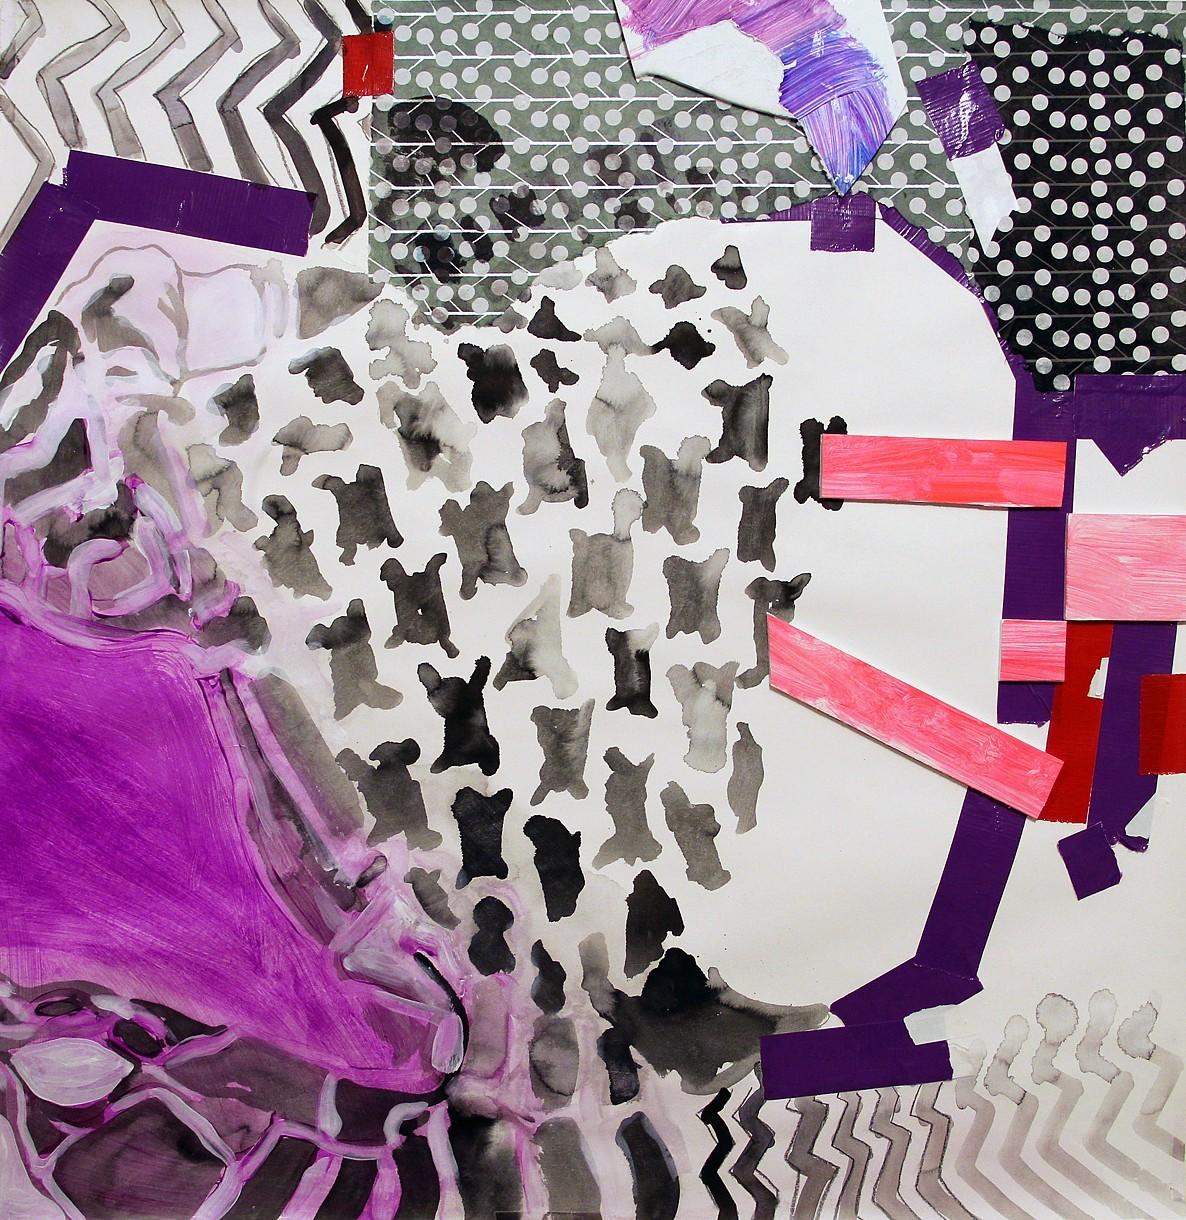 Abstract Study (Purple Pattern)